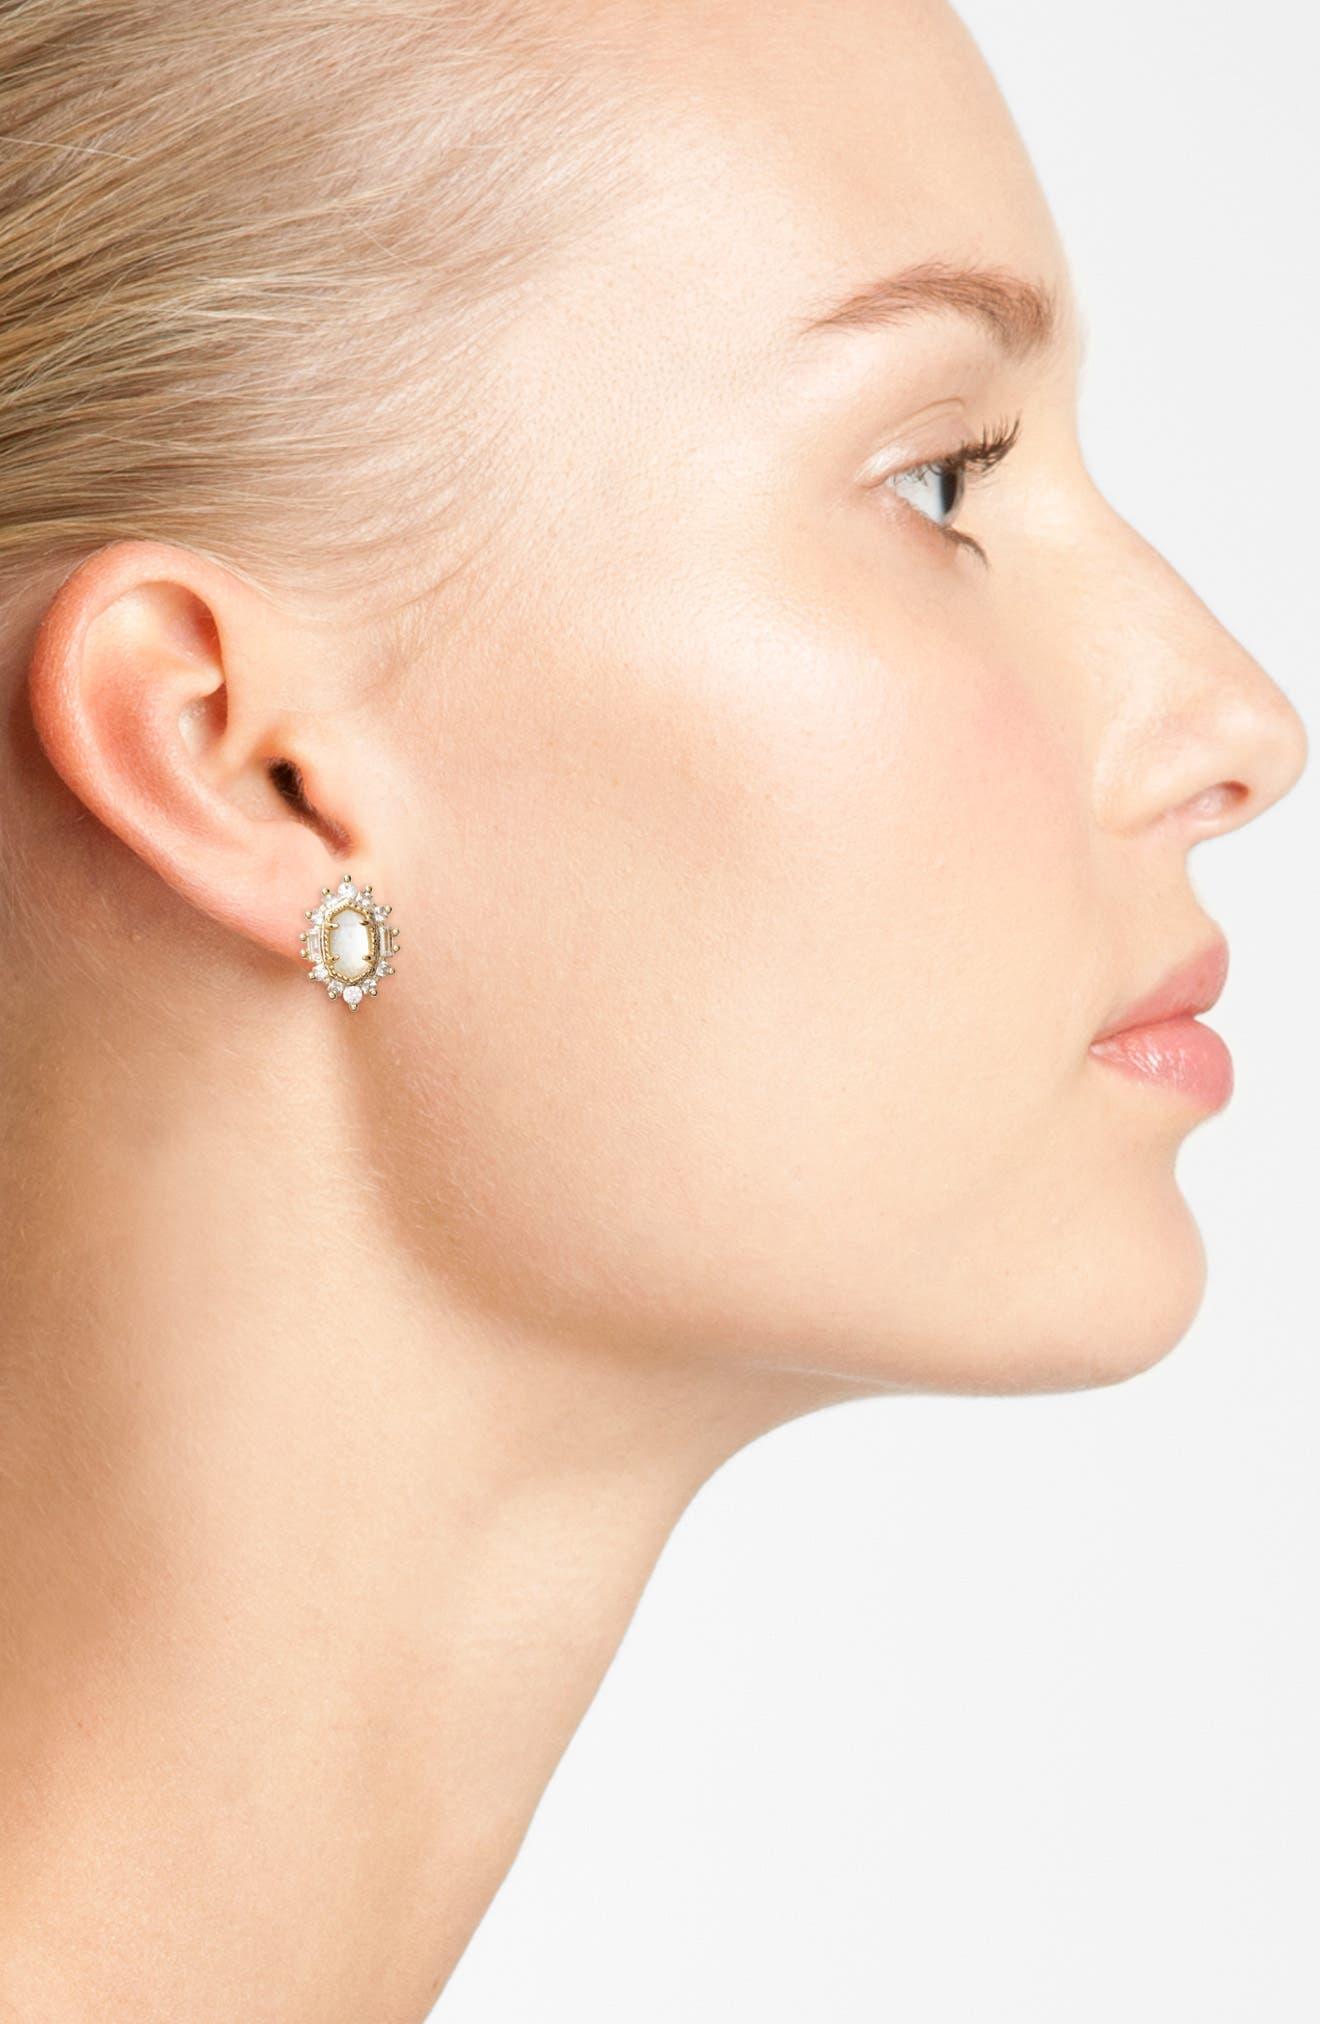 Kaia Stud Earrings,                             Alternate thumbnail 2, color,                             Ivory Mop/ Gold